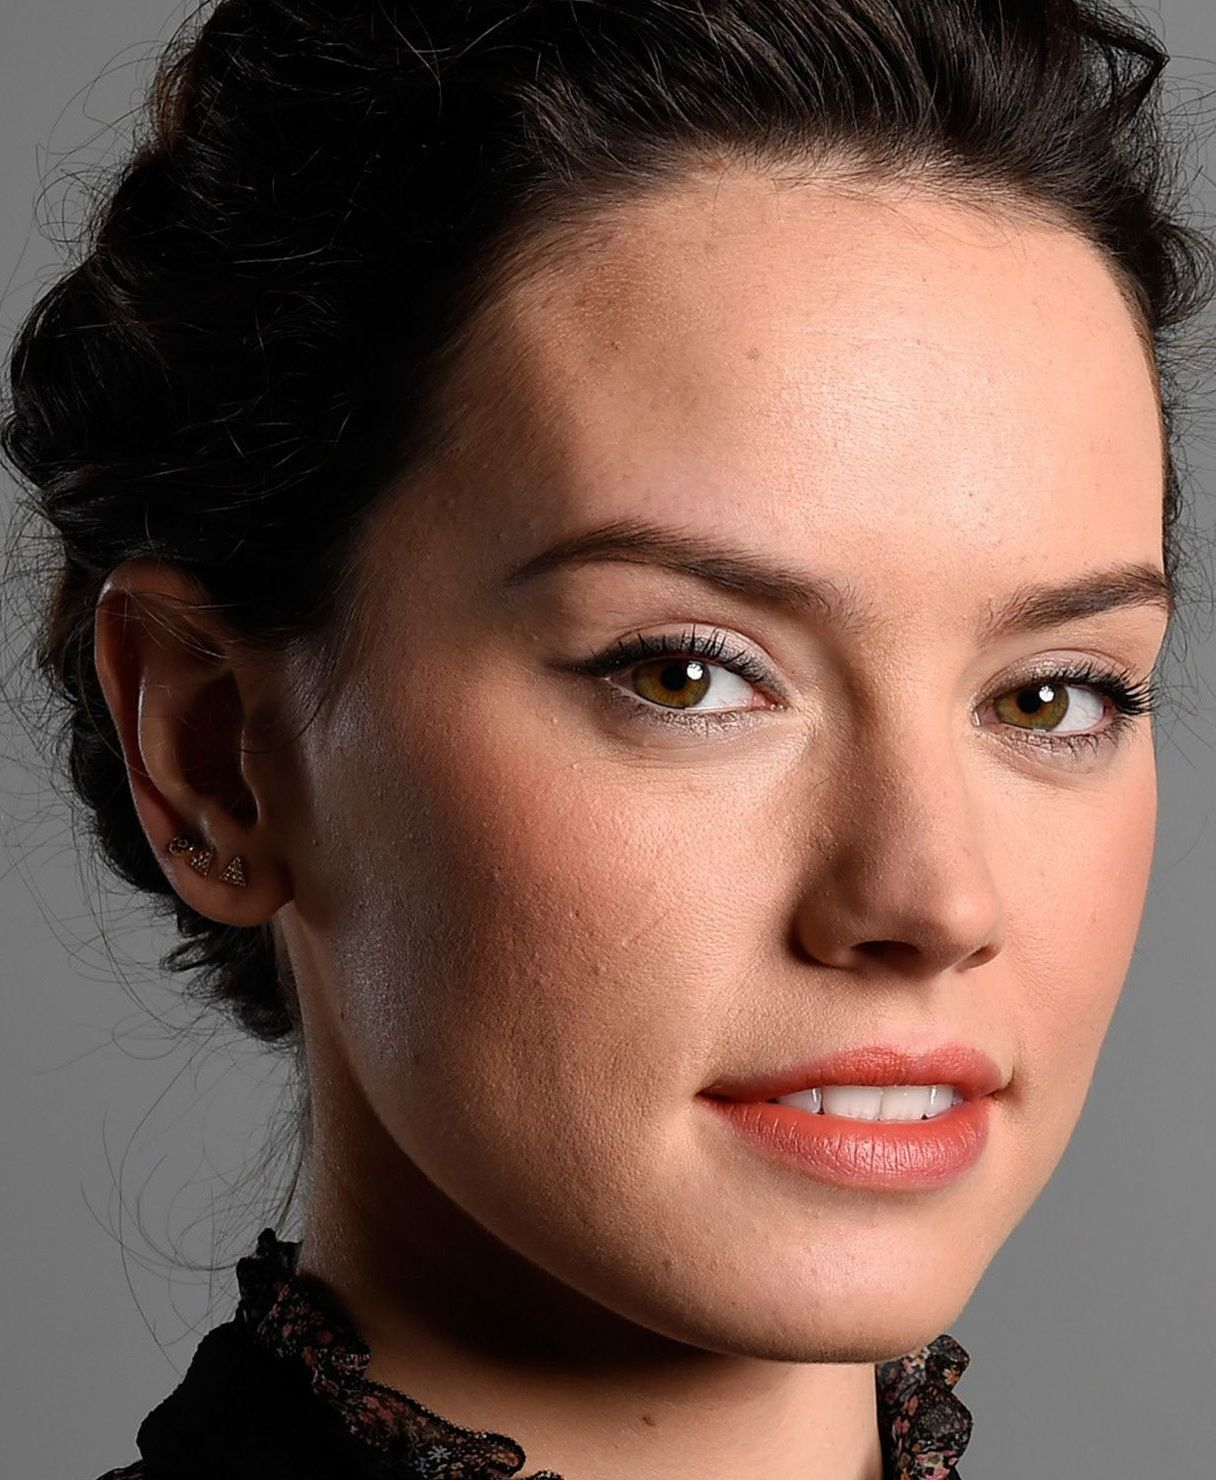 Daisy Ridley Daisy Ridley Celebrity Faces True Beauty